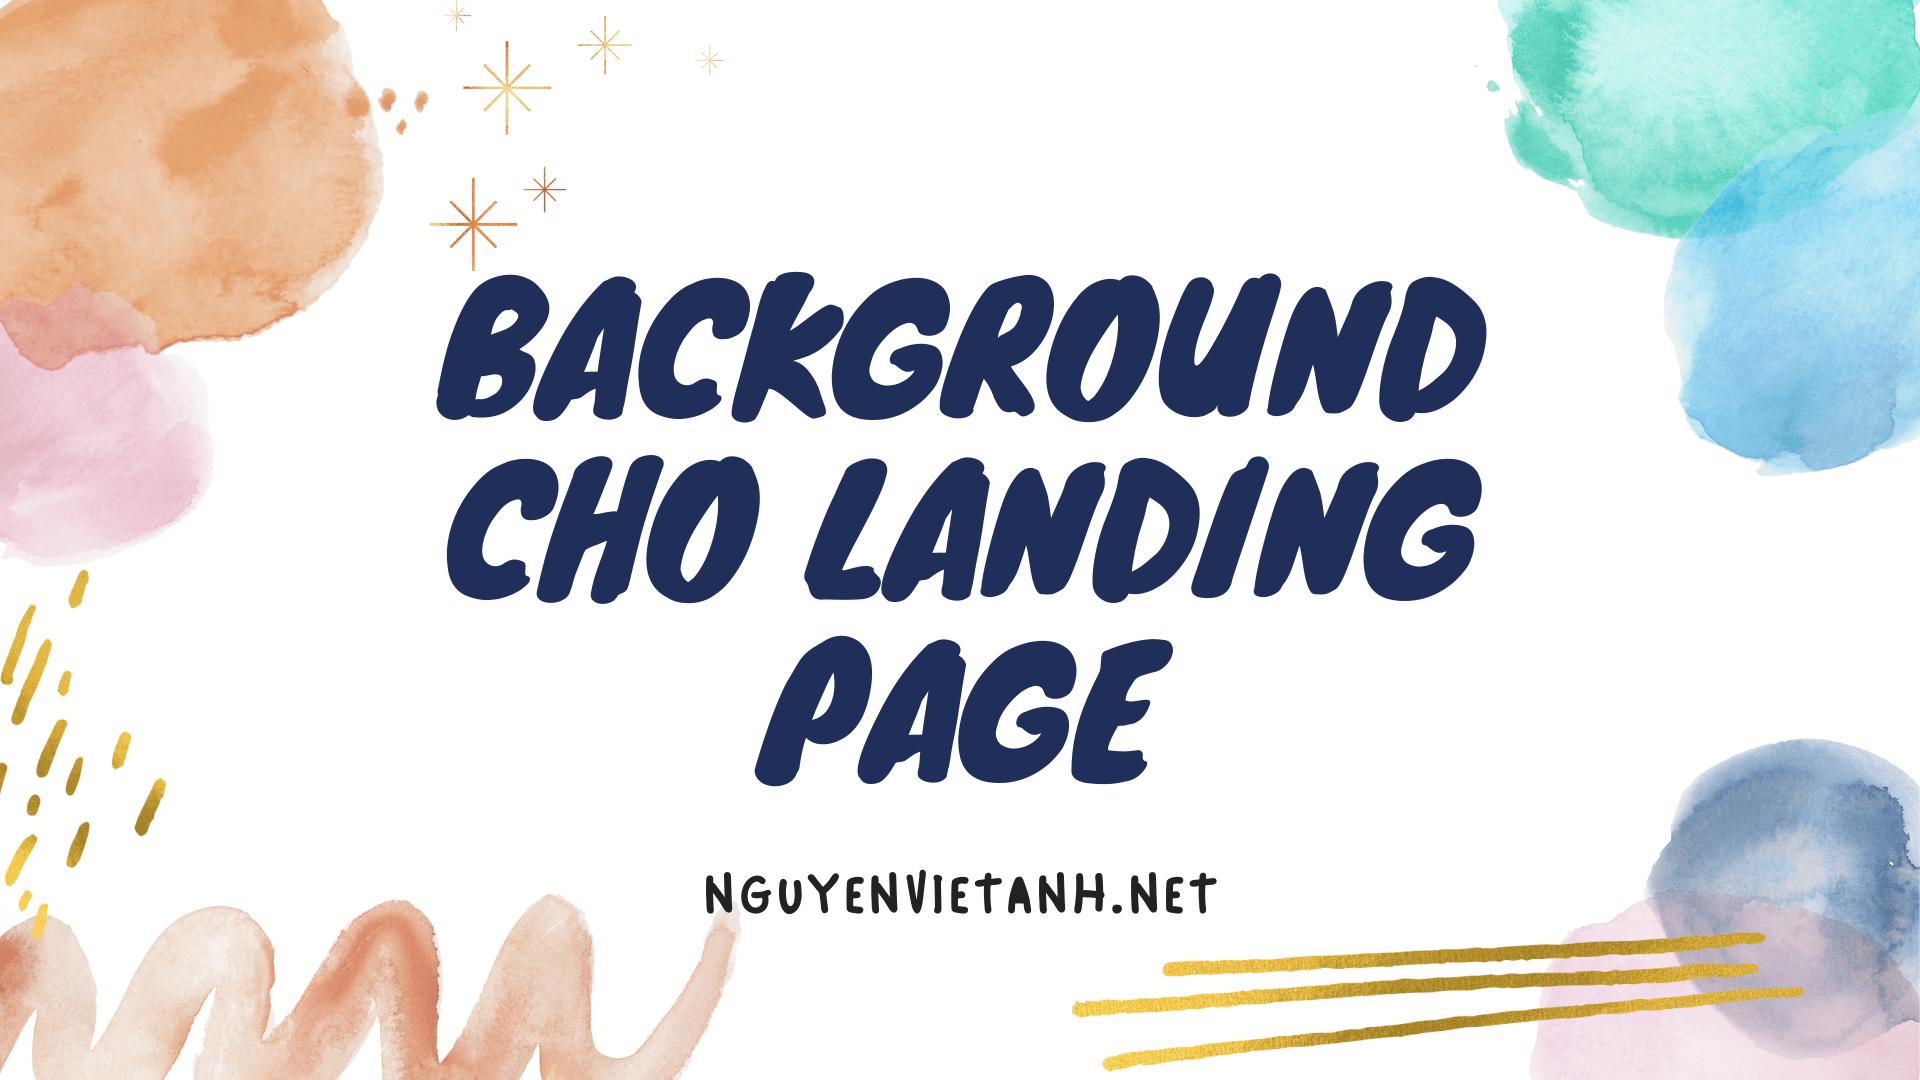 Ảnh nền Background cho Landing page